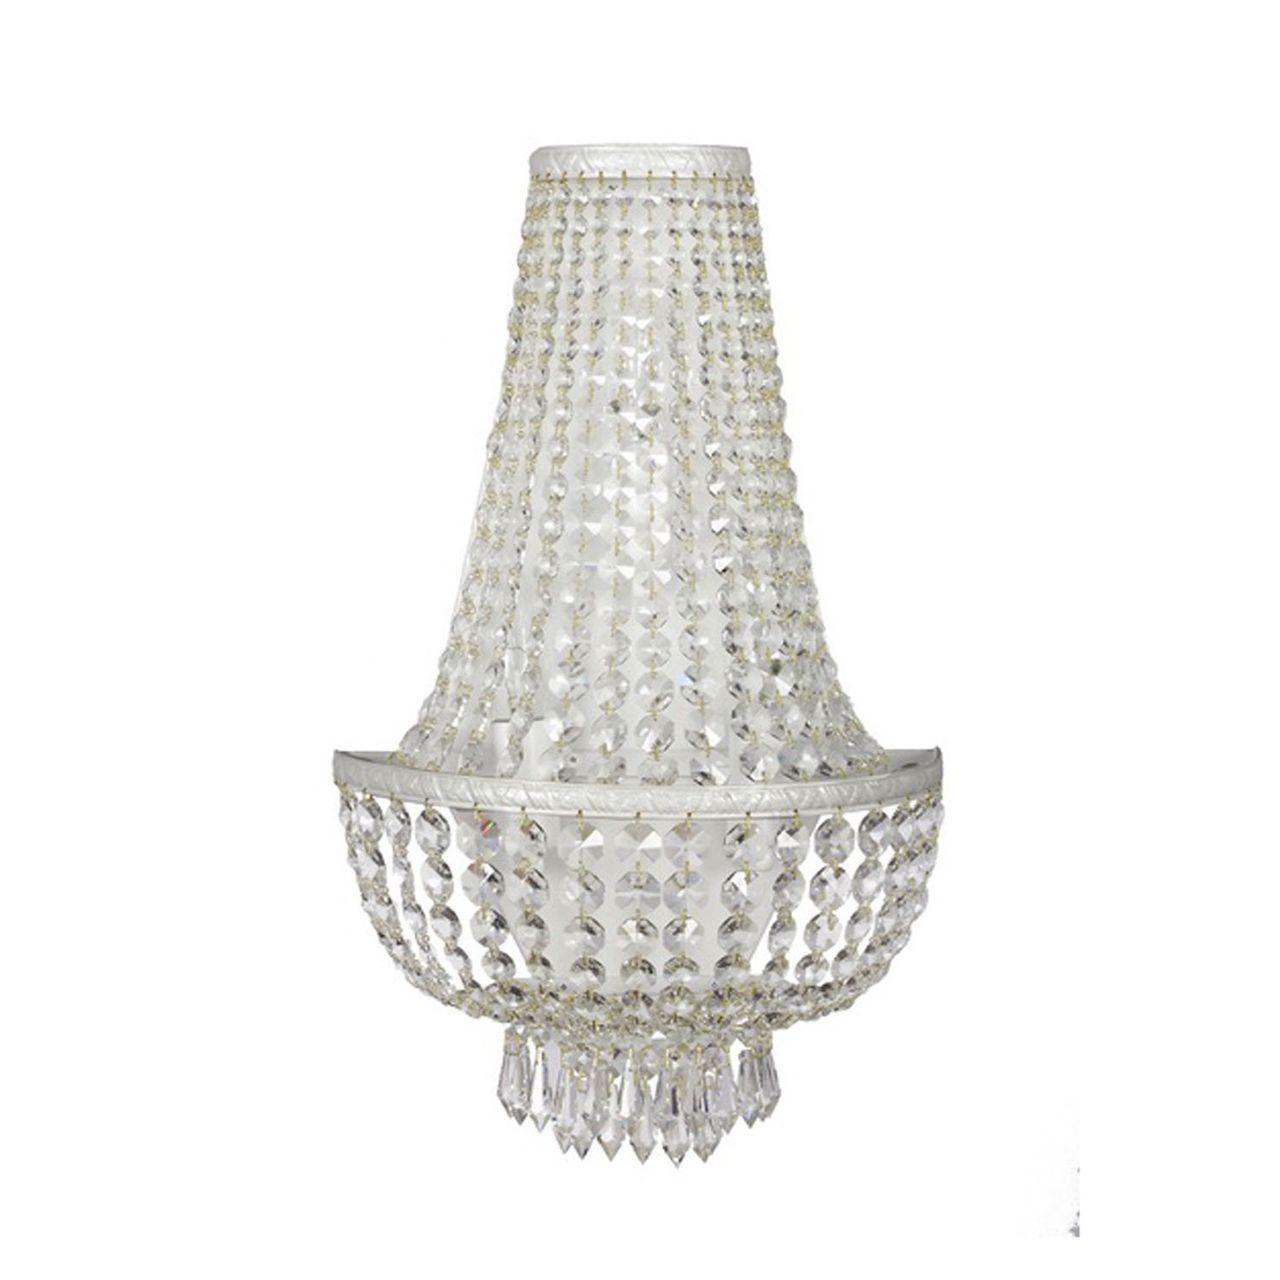 Фото #1: Настенный светильник Arti Lampadari Nobile e 2.20.100 wg